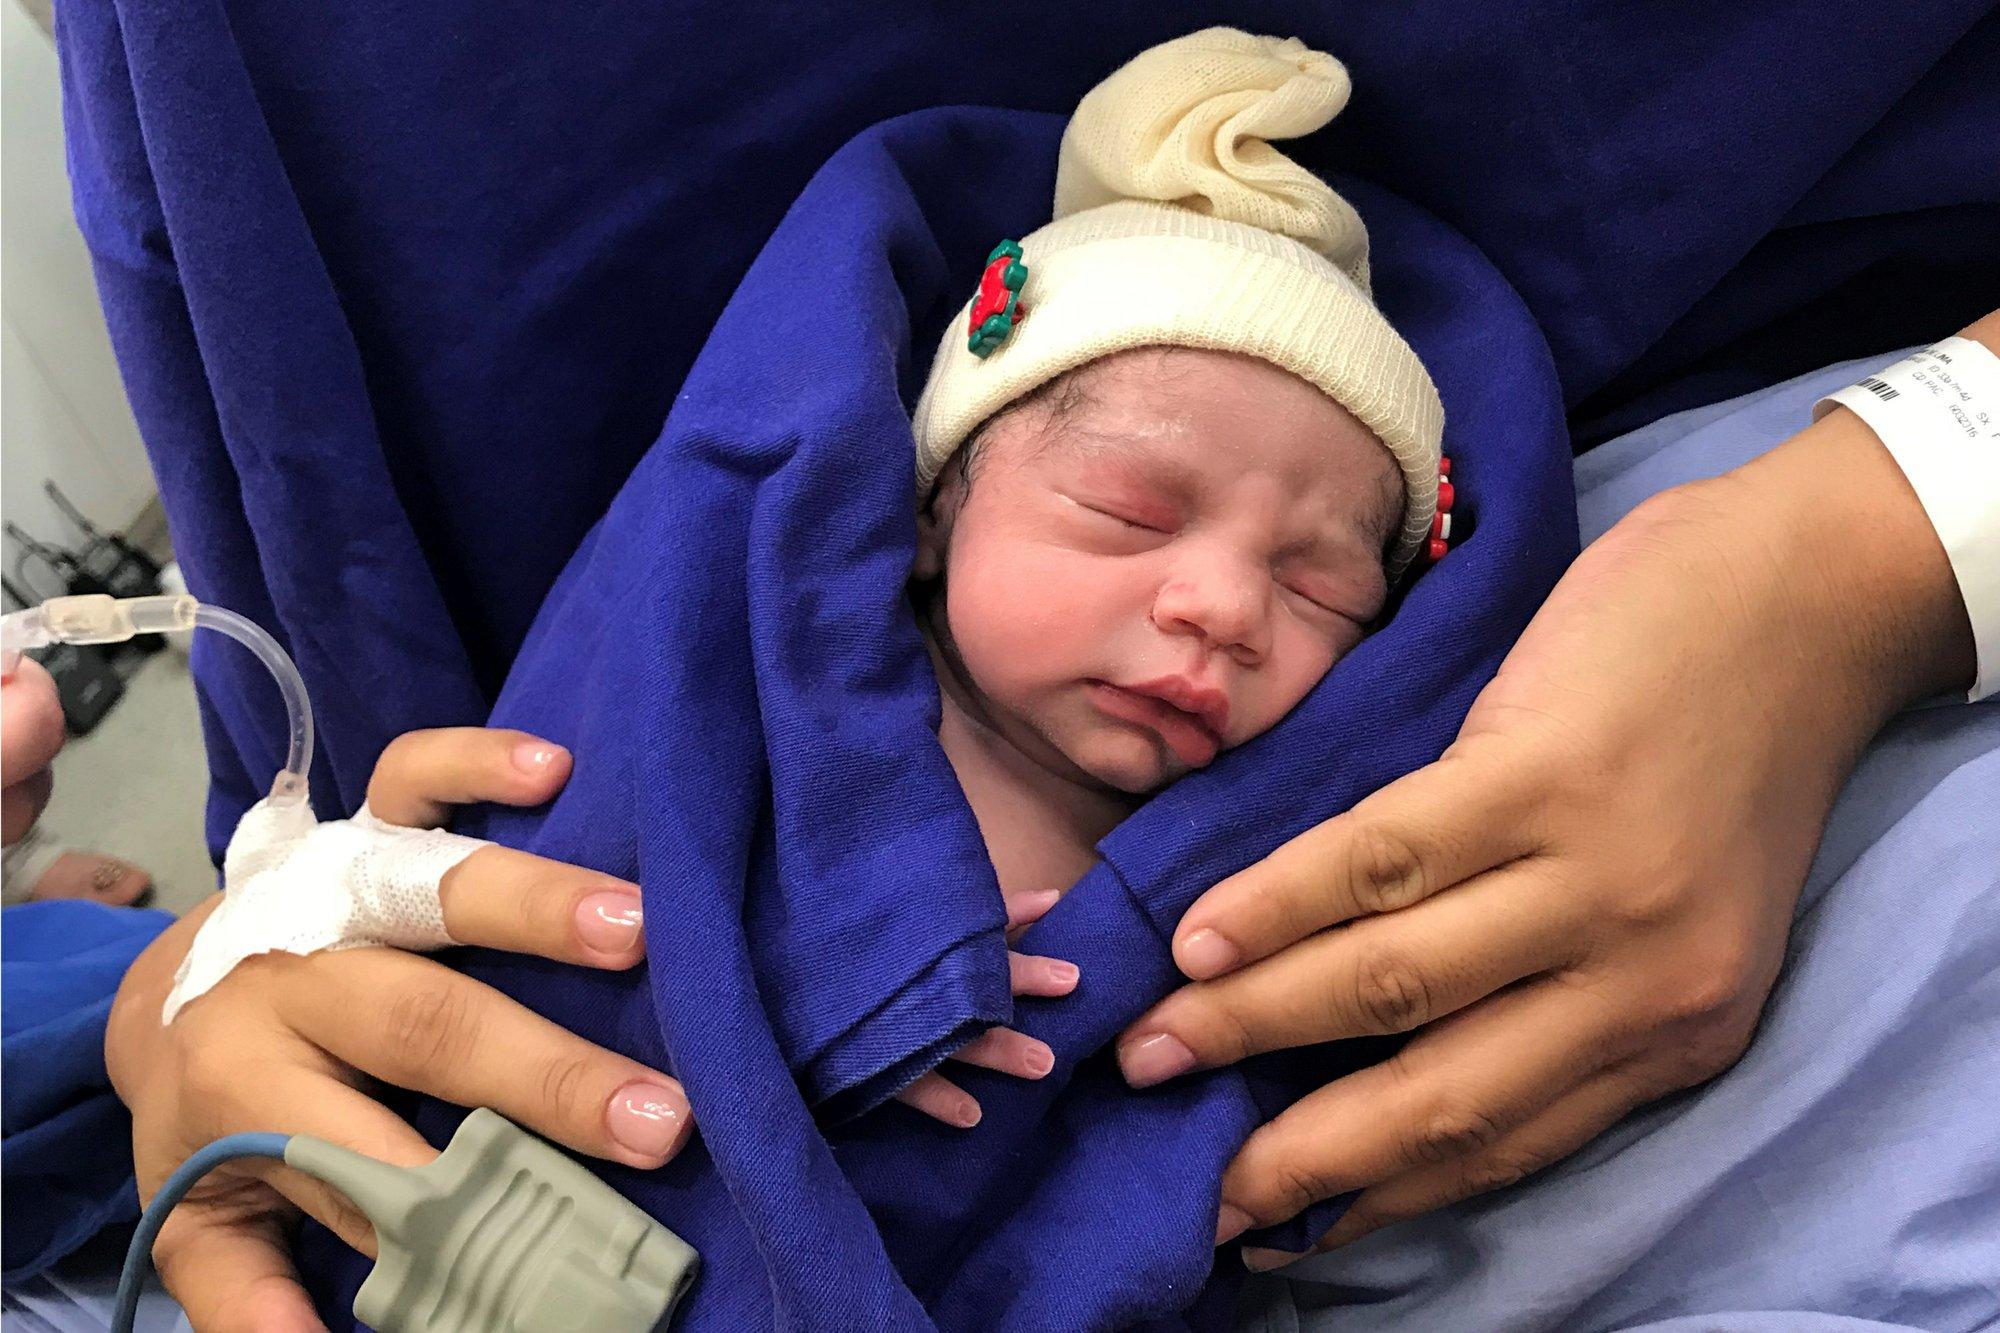 transplant uterus baby ap_1543979969432.jpeg.jpg